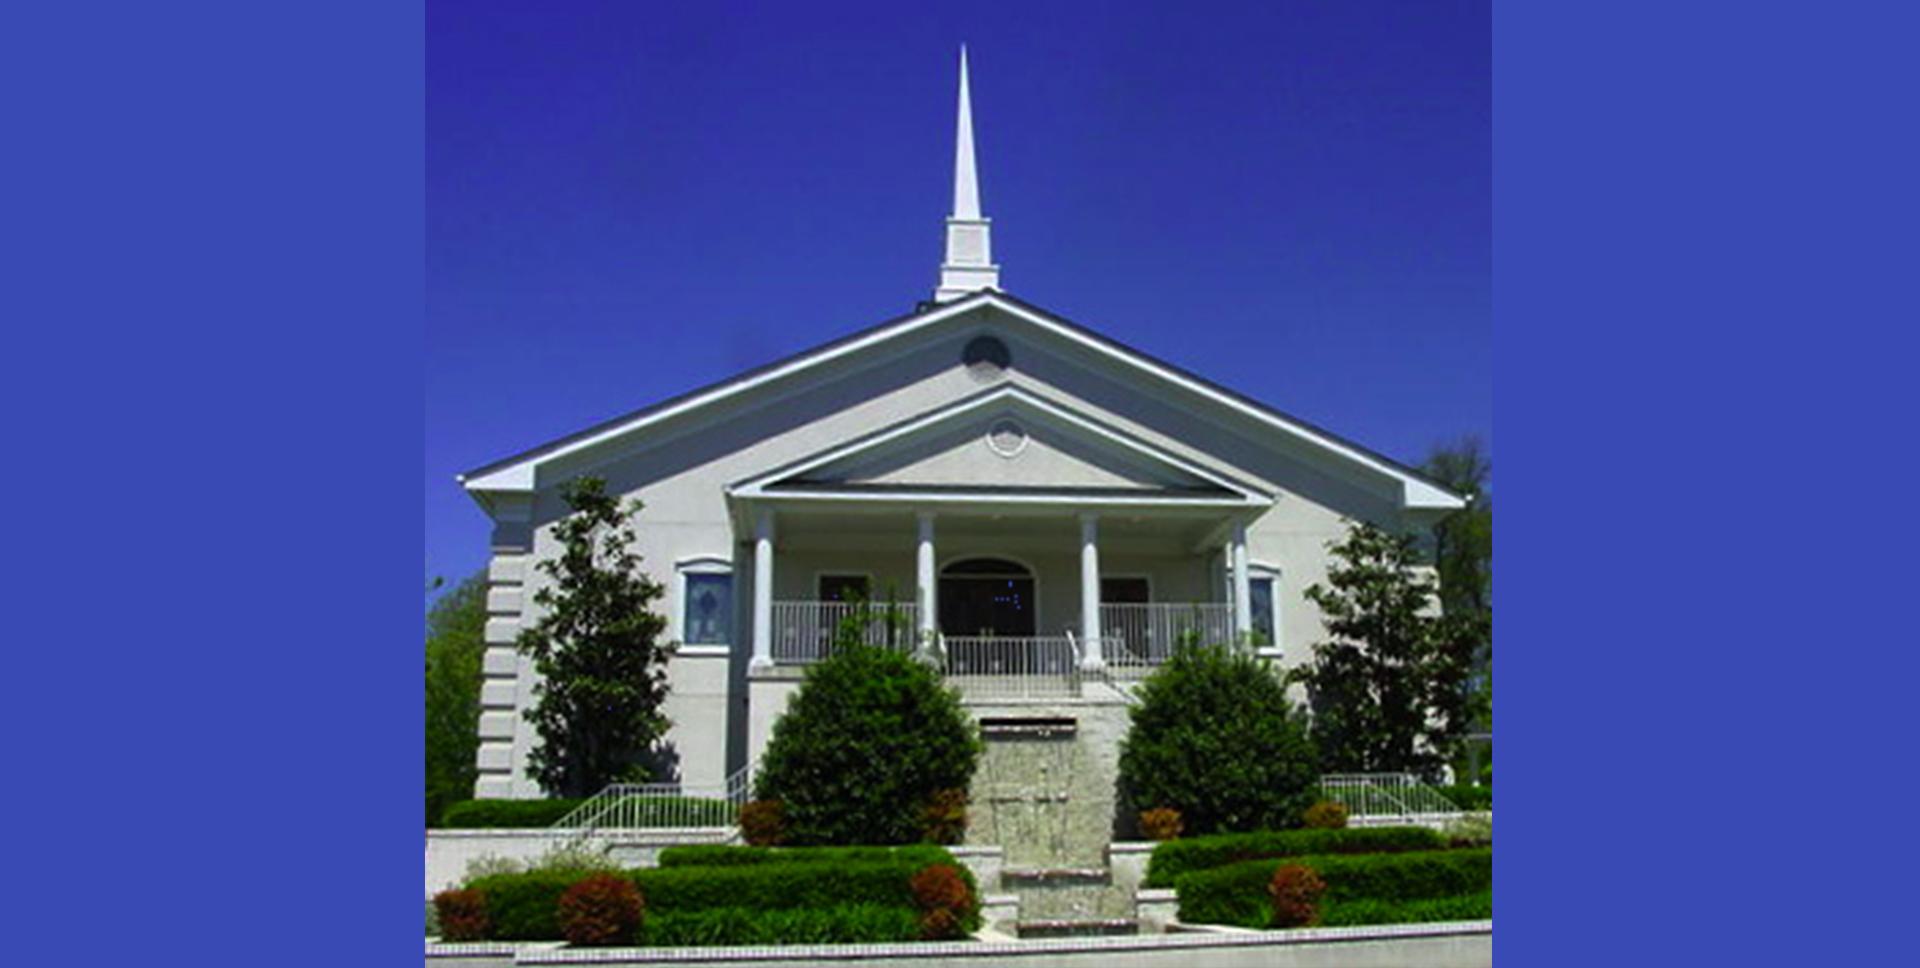 First Mt. Olive Baptist Church